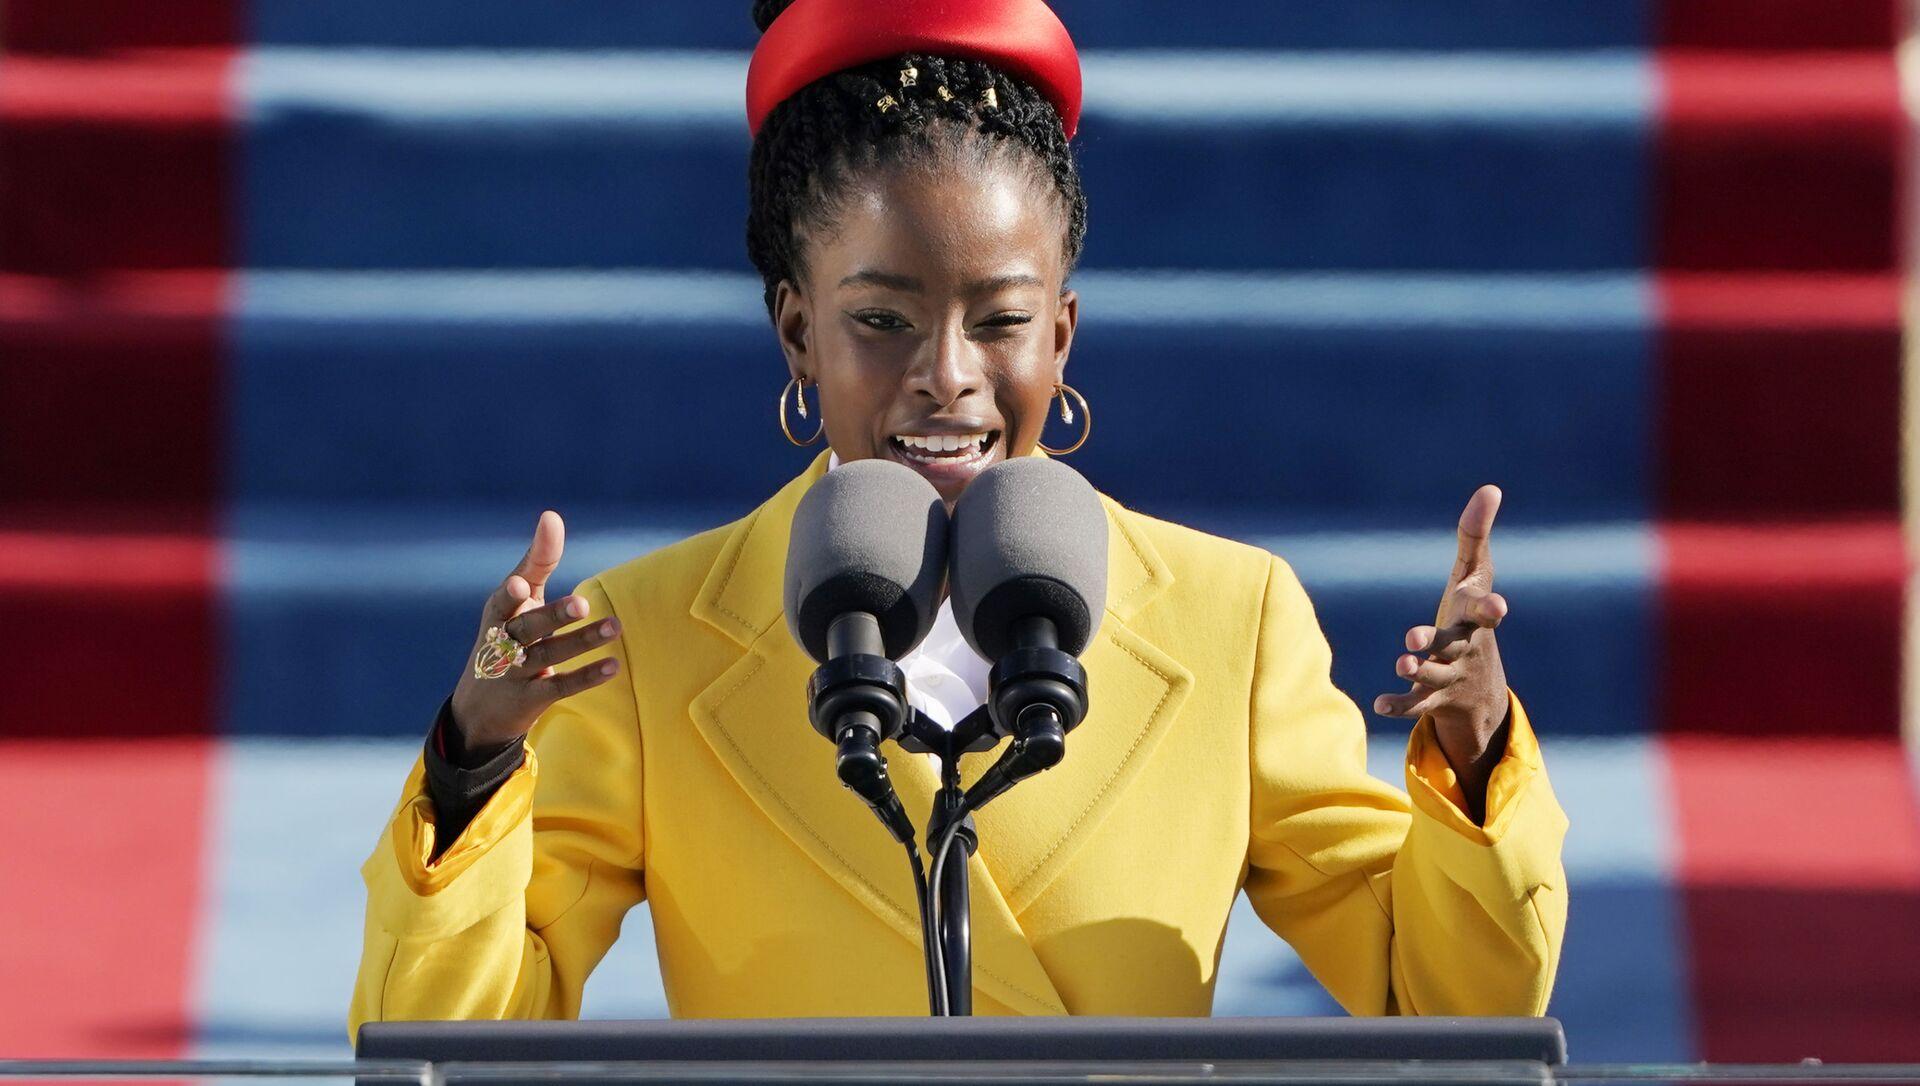 Аmerická básnířka Amanda Gormanová na inauguraci amerického prezidenta Joea Bidenea - Sputnik Česká republika, 1920, 13.03.2021